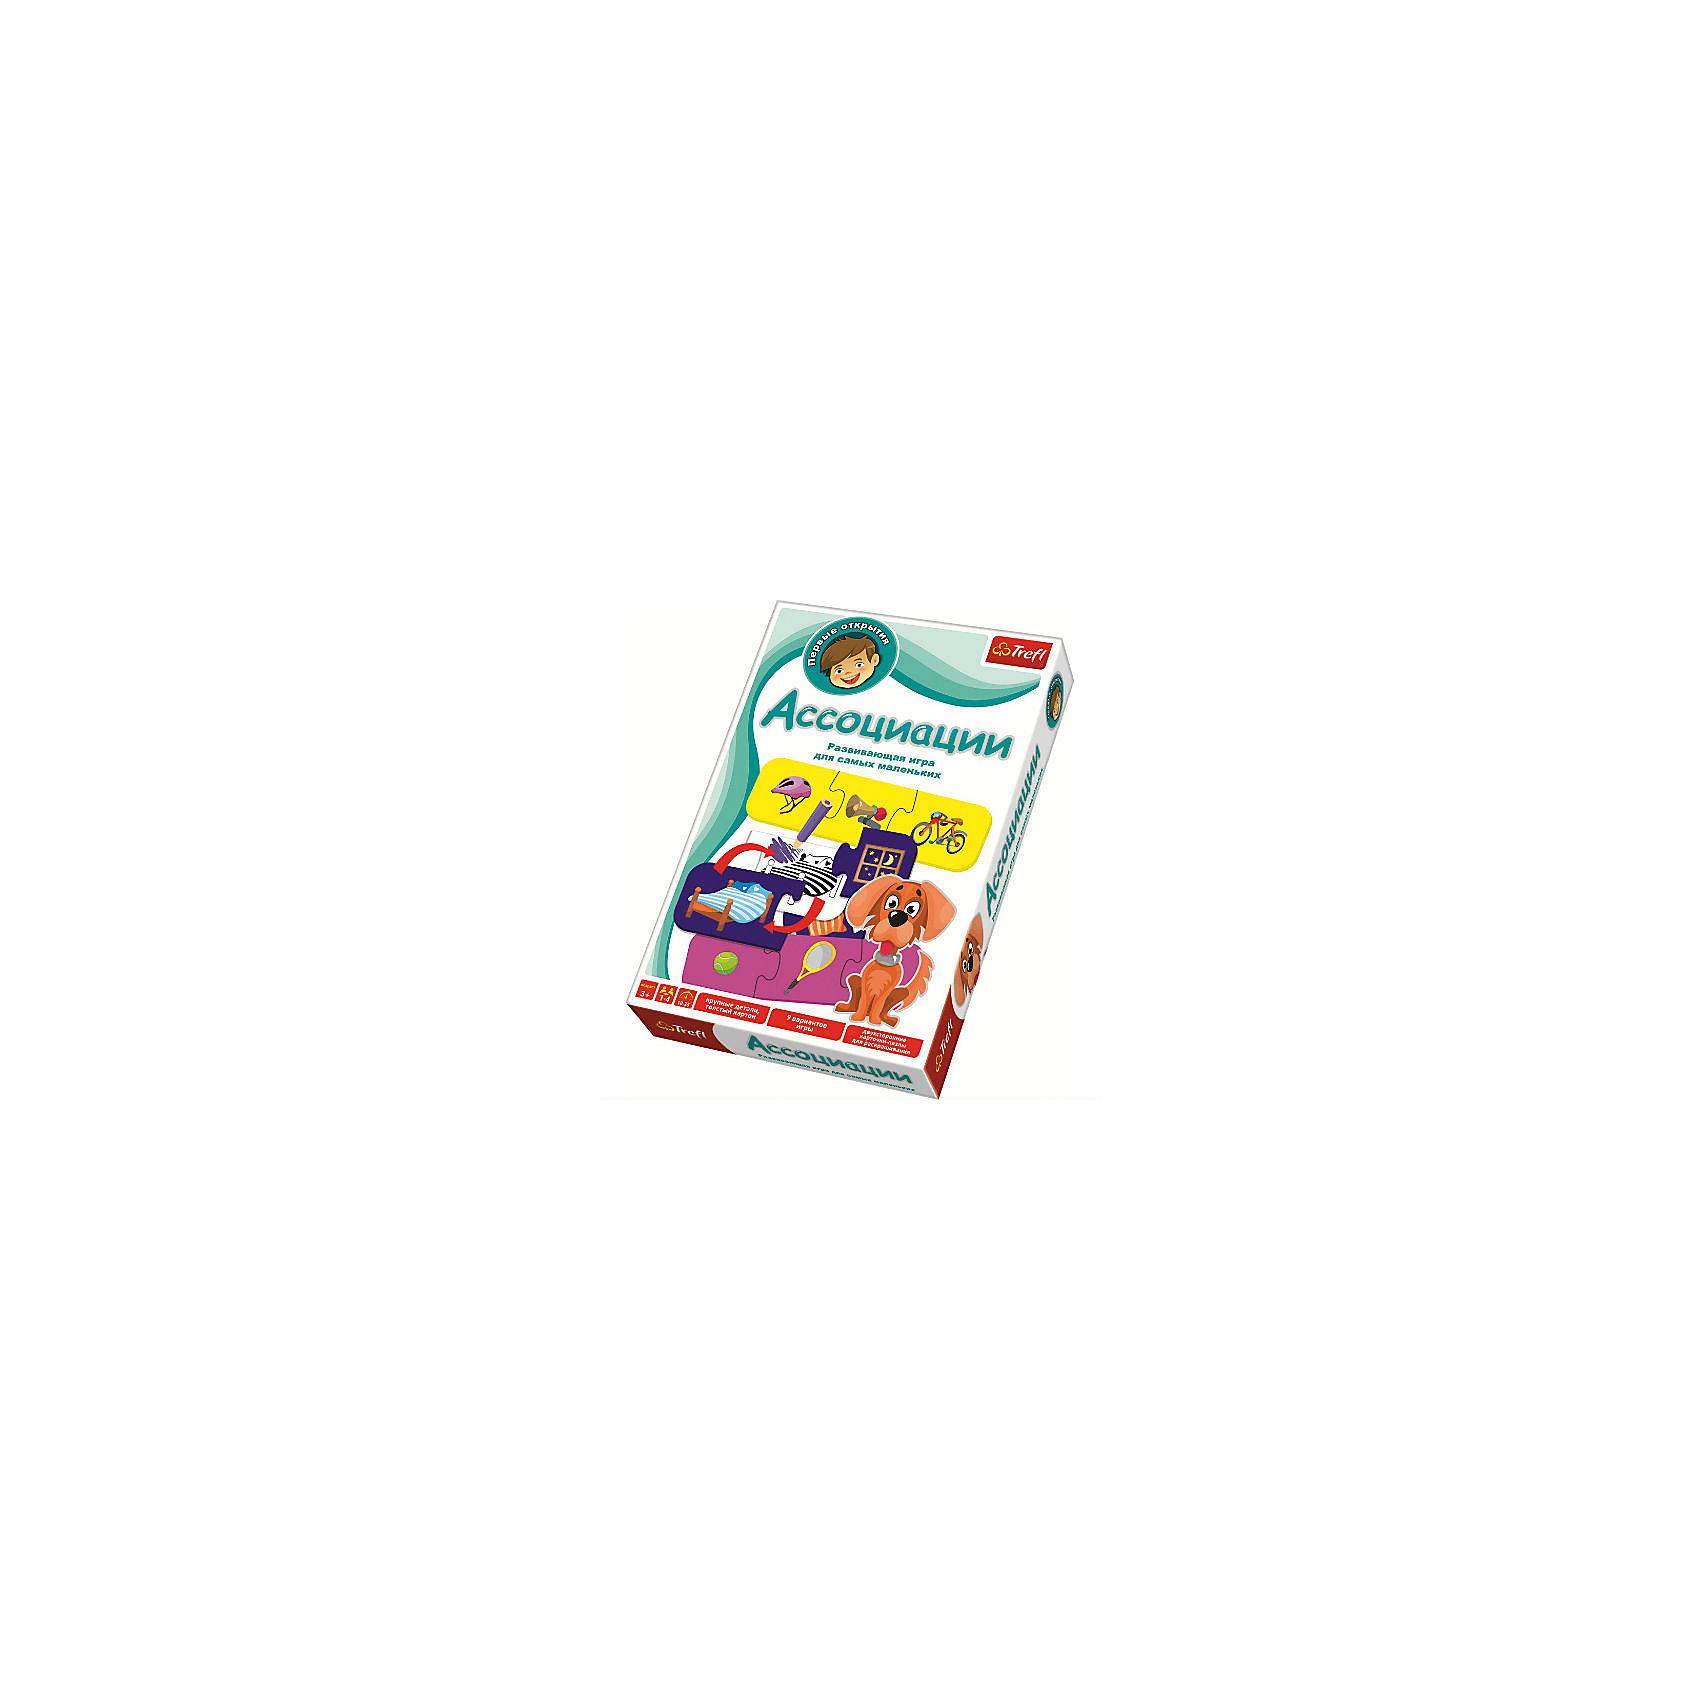 Trefl Игра Ассоциации,  Trefl trefl ассоциации 01102t